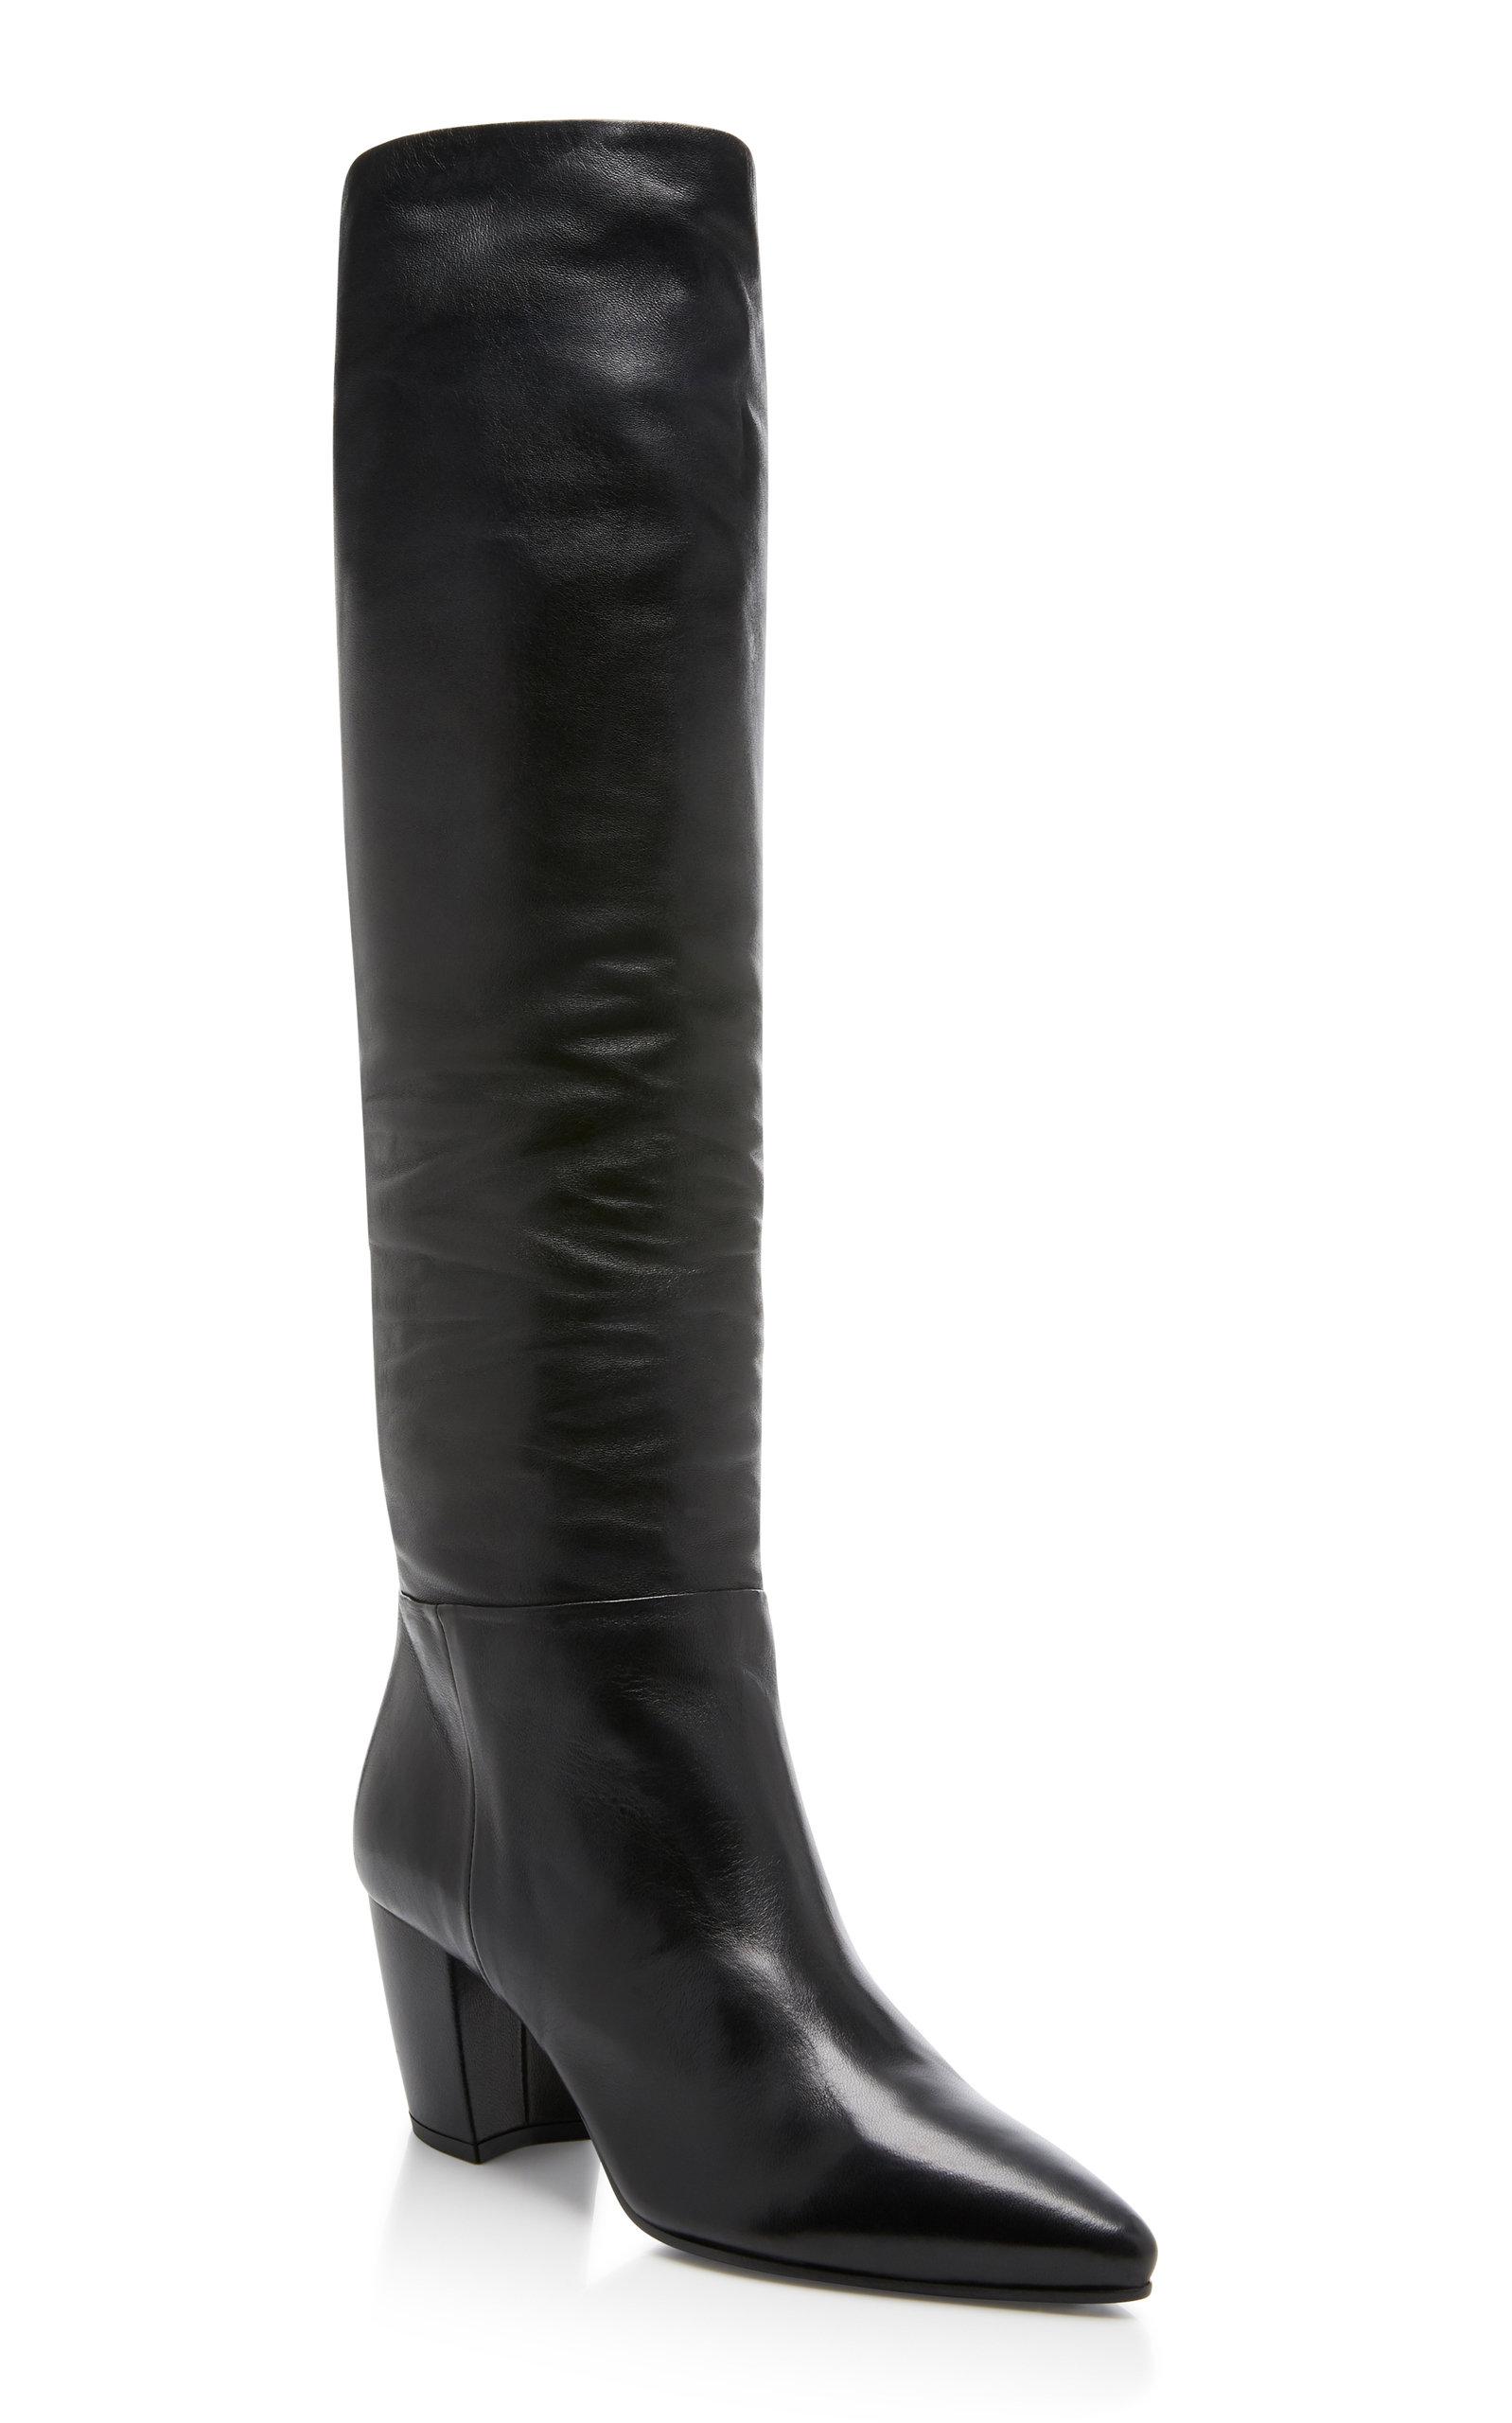 e47739e4964 Prada Slouchy Leather Boots | AW19 | Boots, Leather boots, Prada